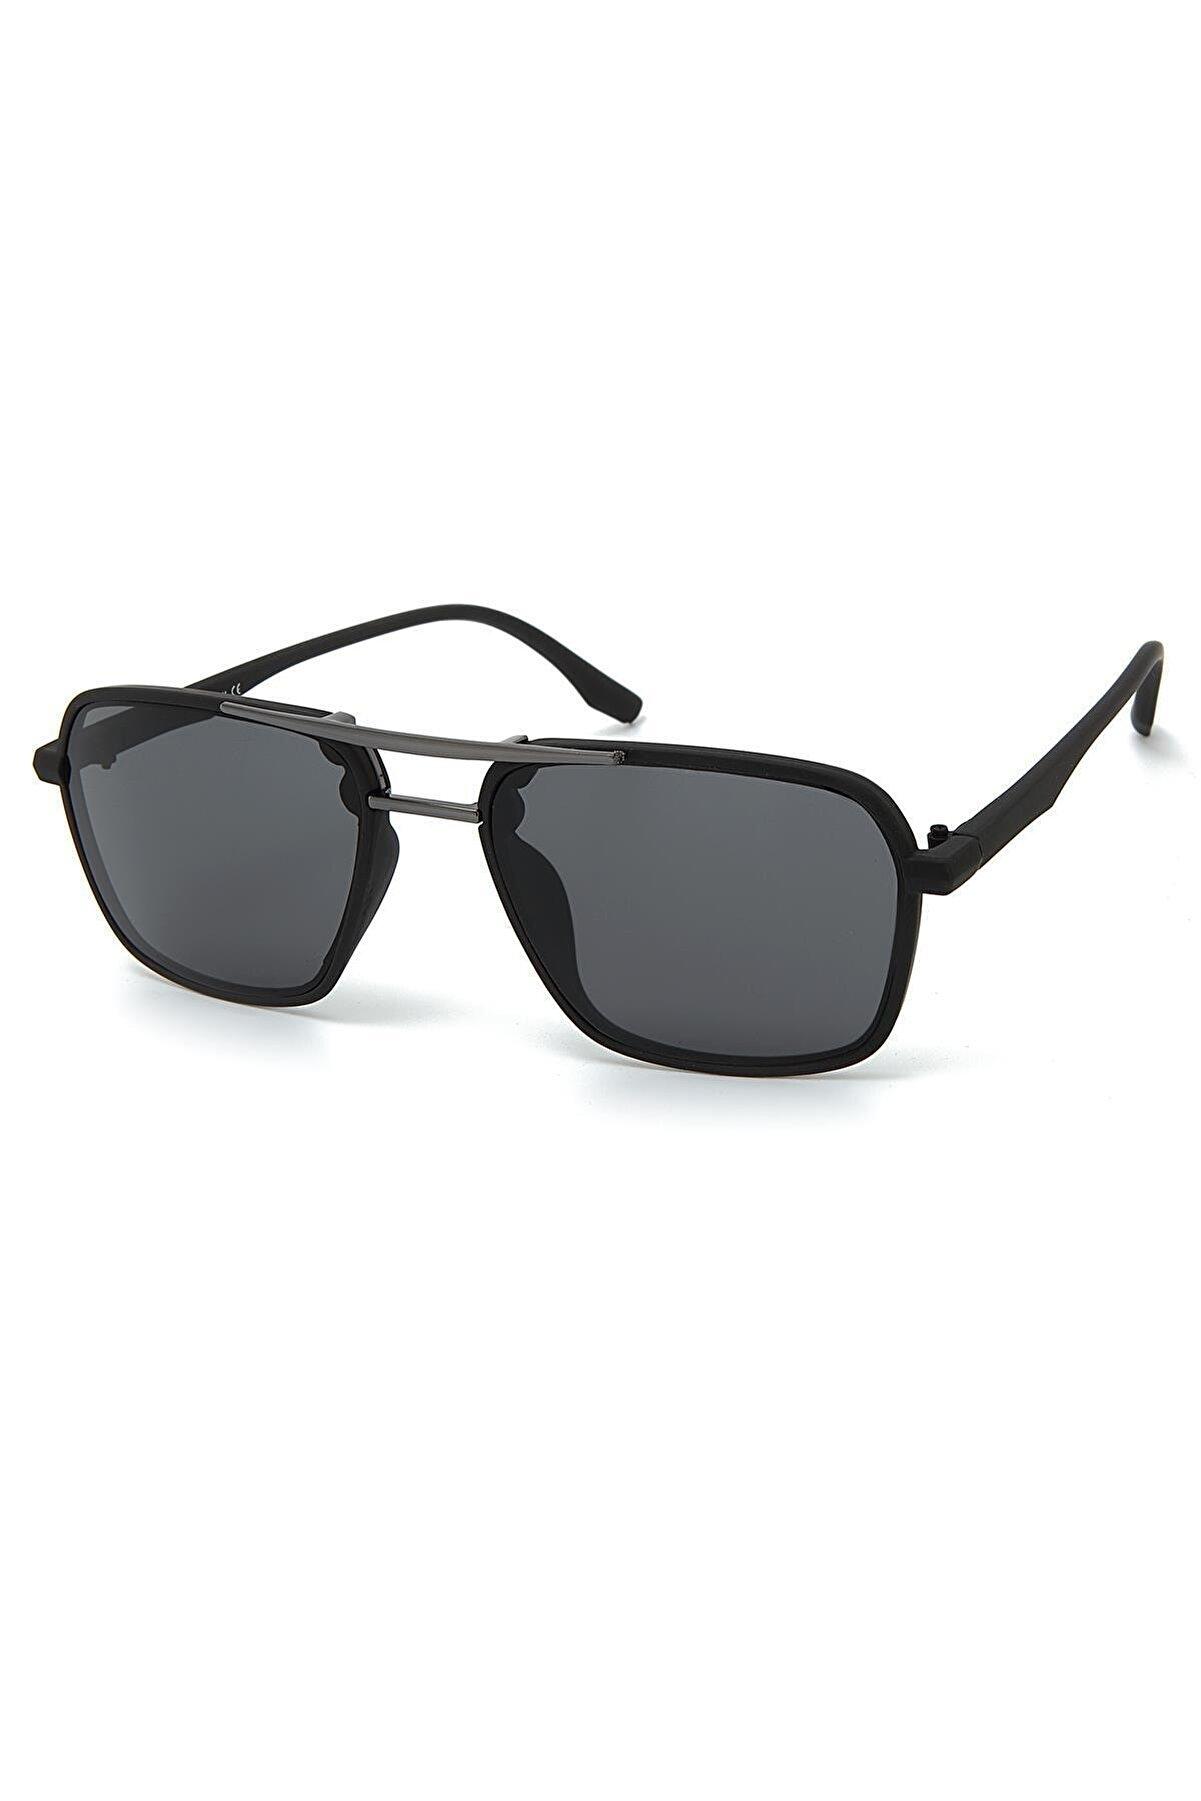 Belletti Unisex Güneş Gözlüğü Blt21128a